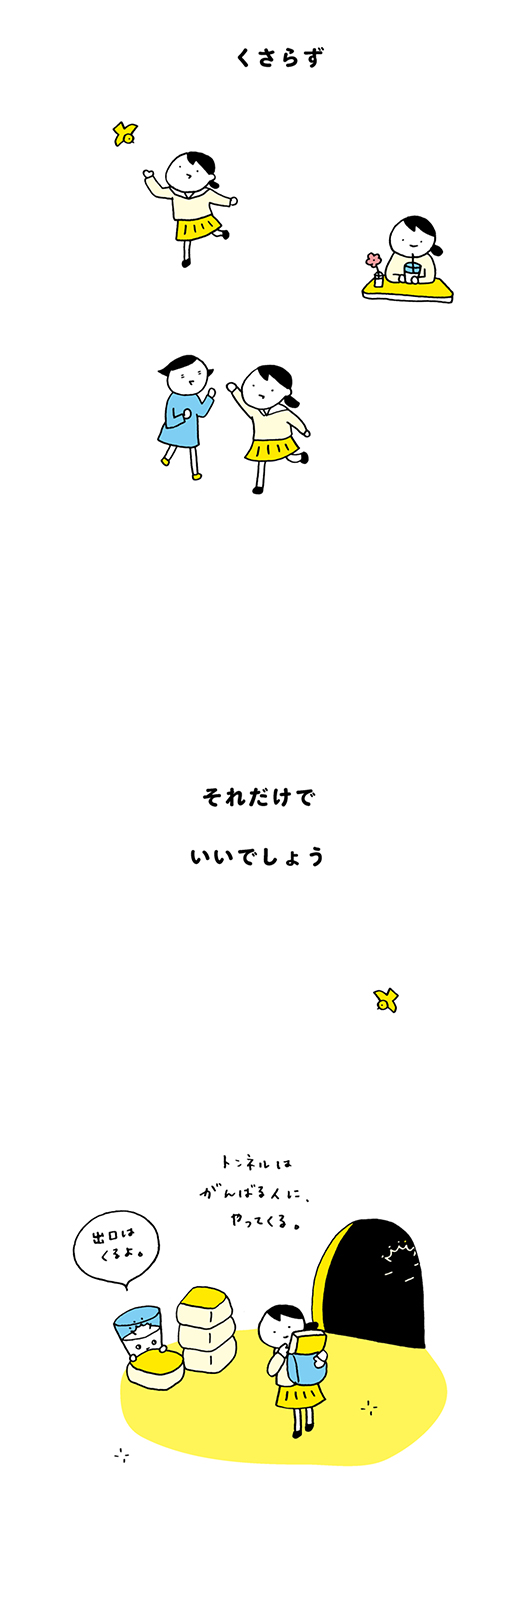 kotaete_170517_04